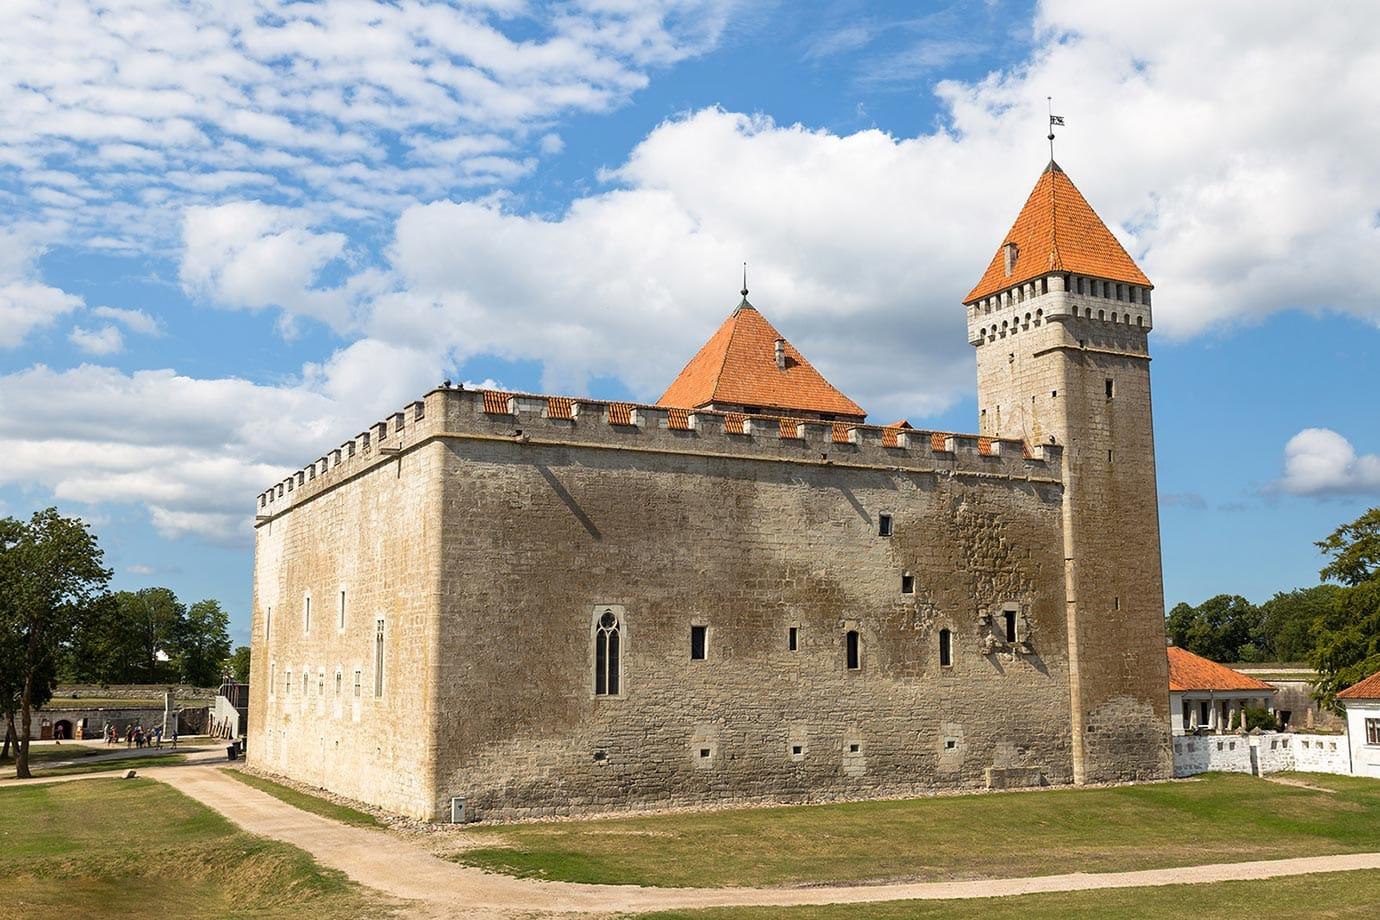 Castles in Estonia